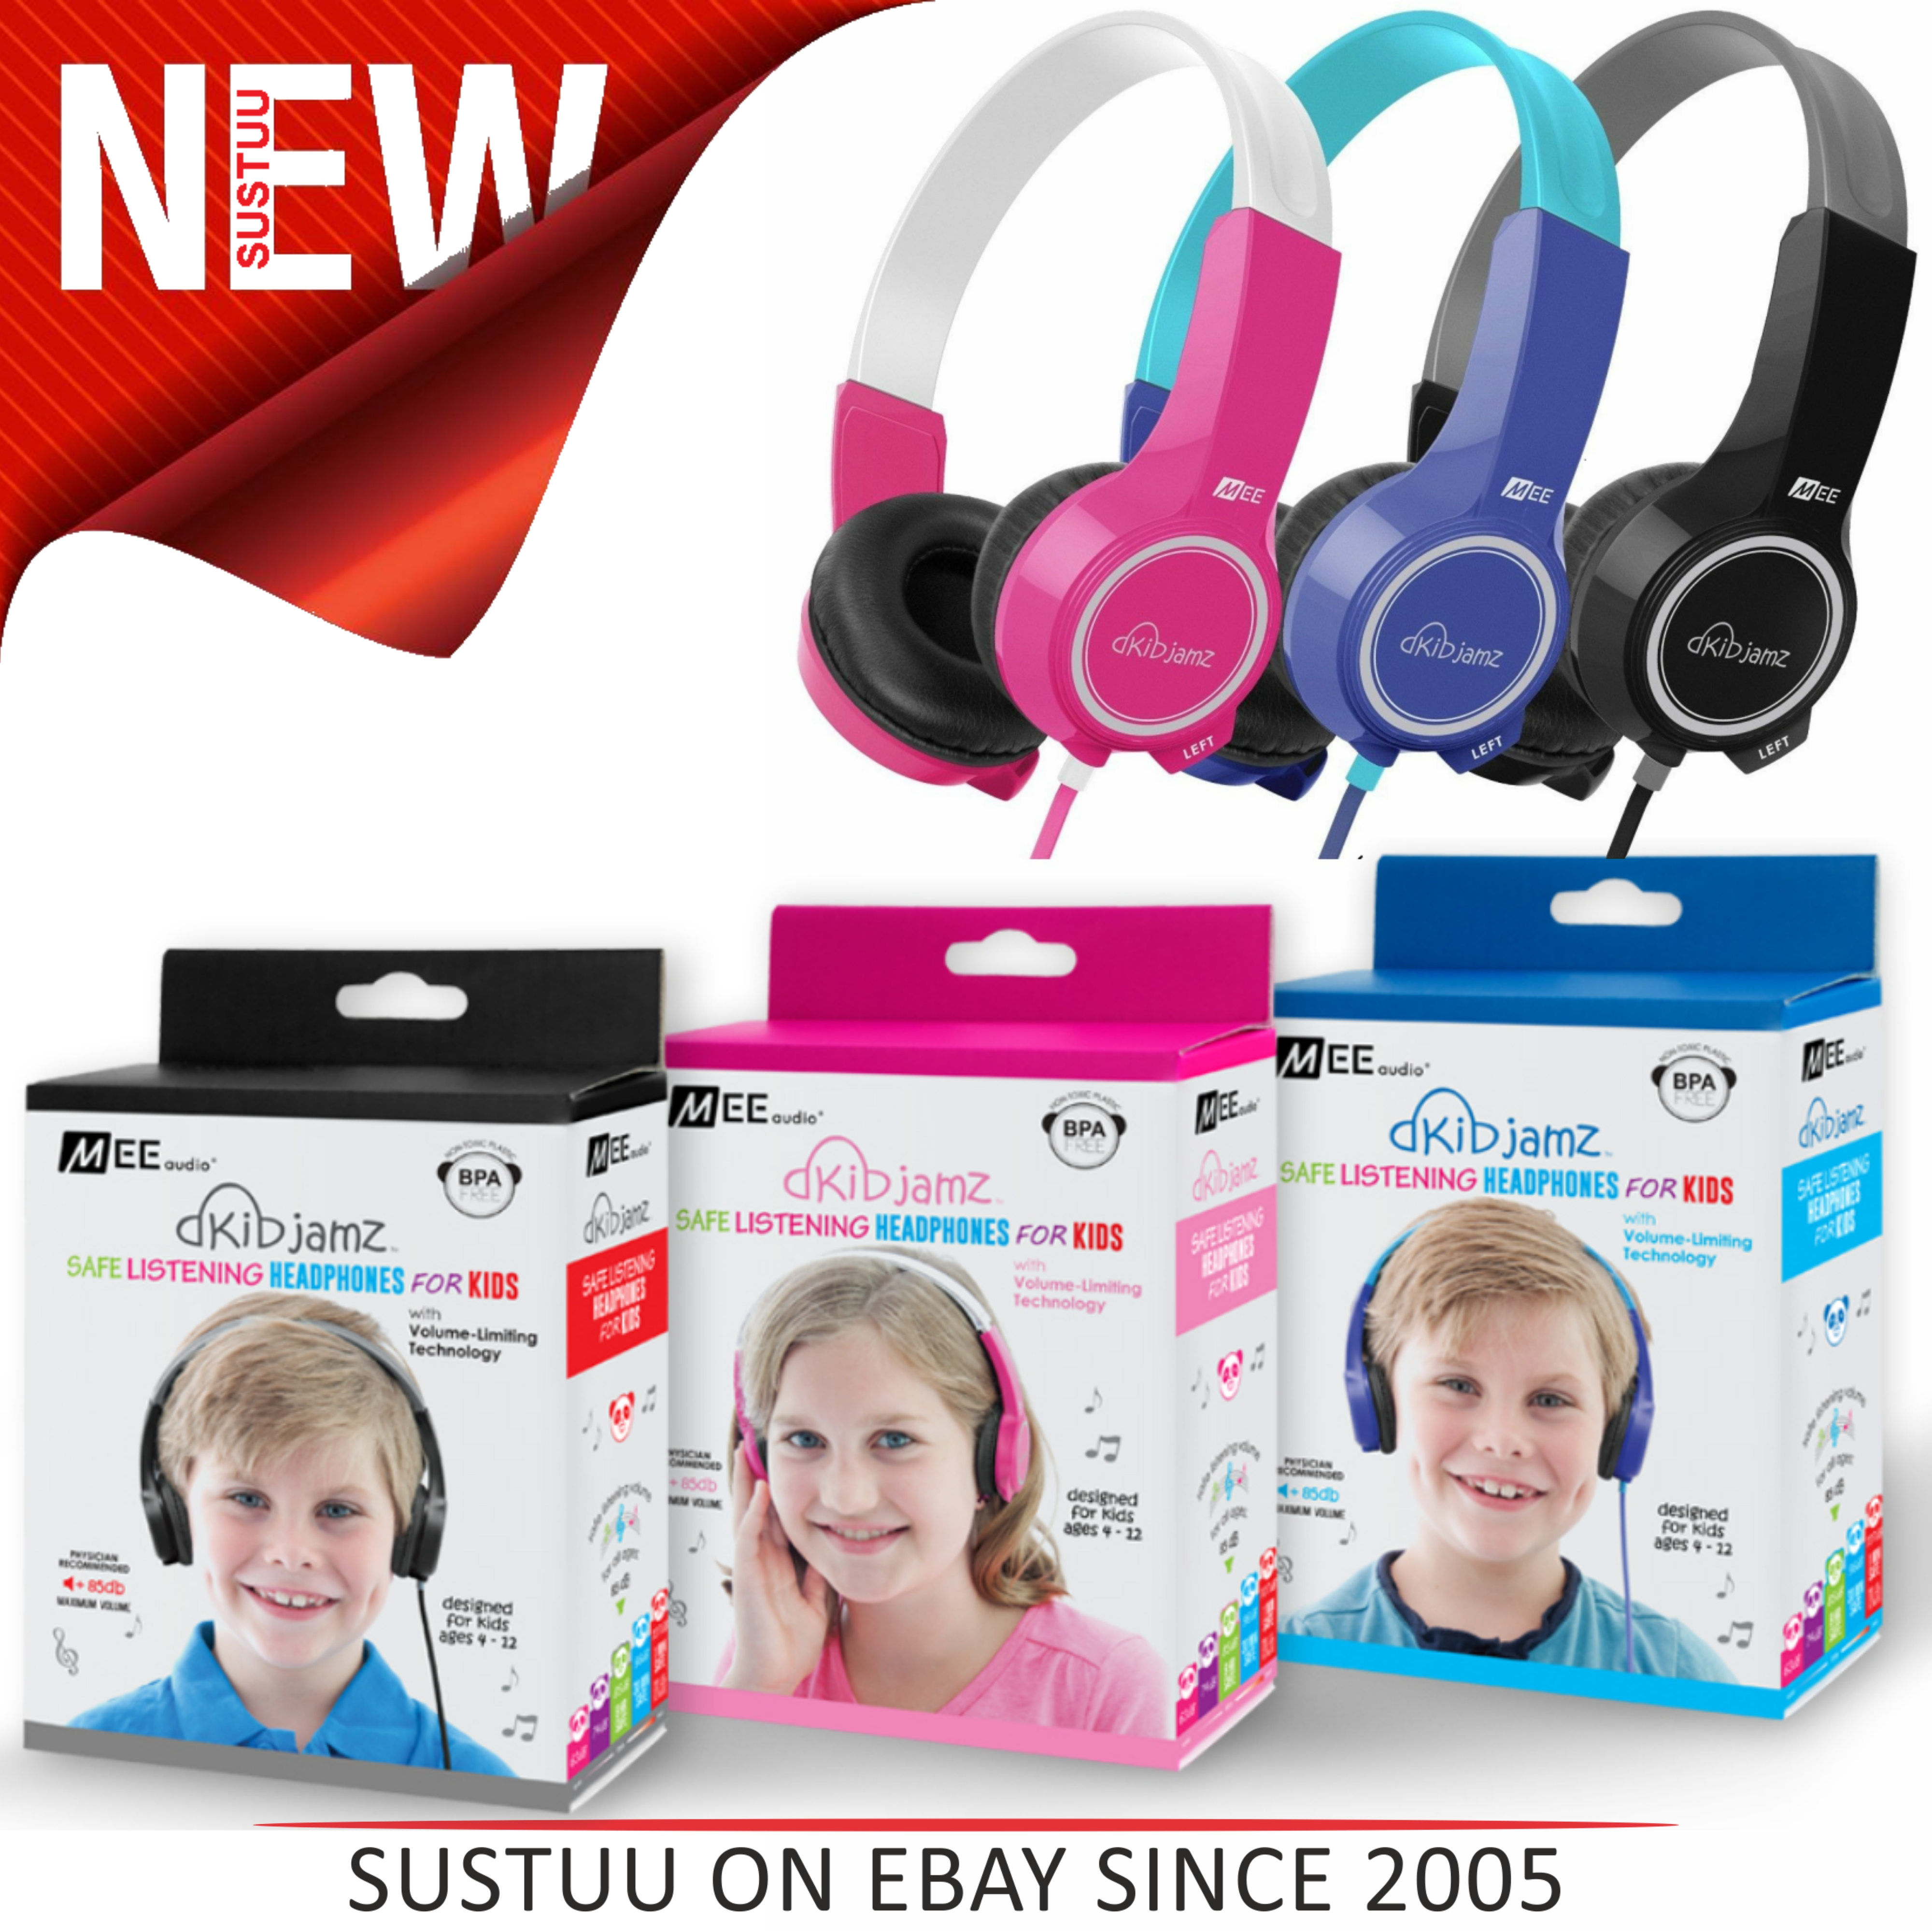 MEE Audio KidJamz KJ25 Safe Listening Headphones For Kids With Volume-Limit Technology